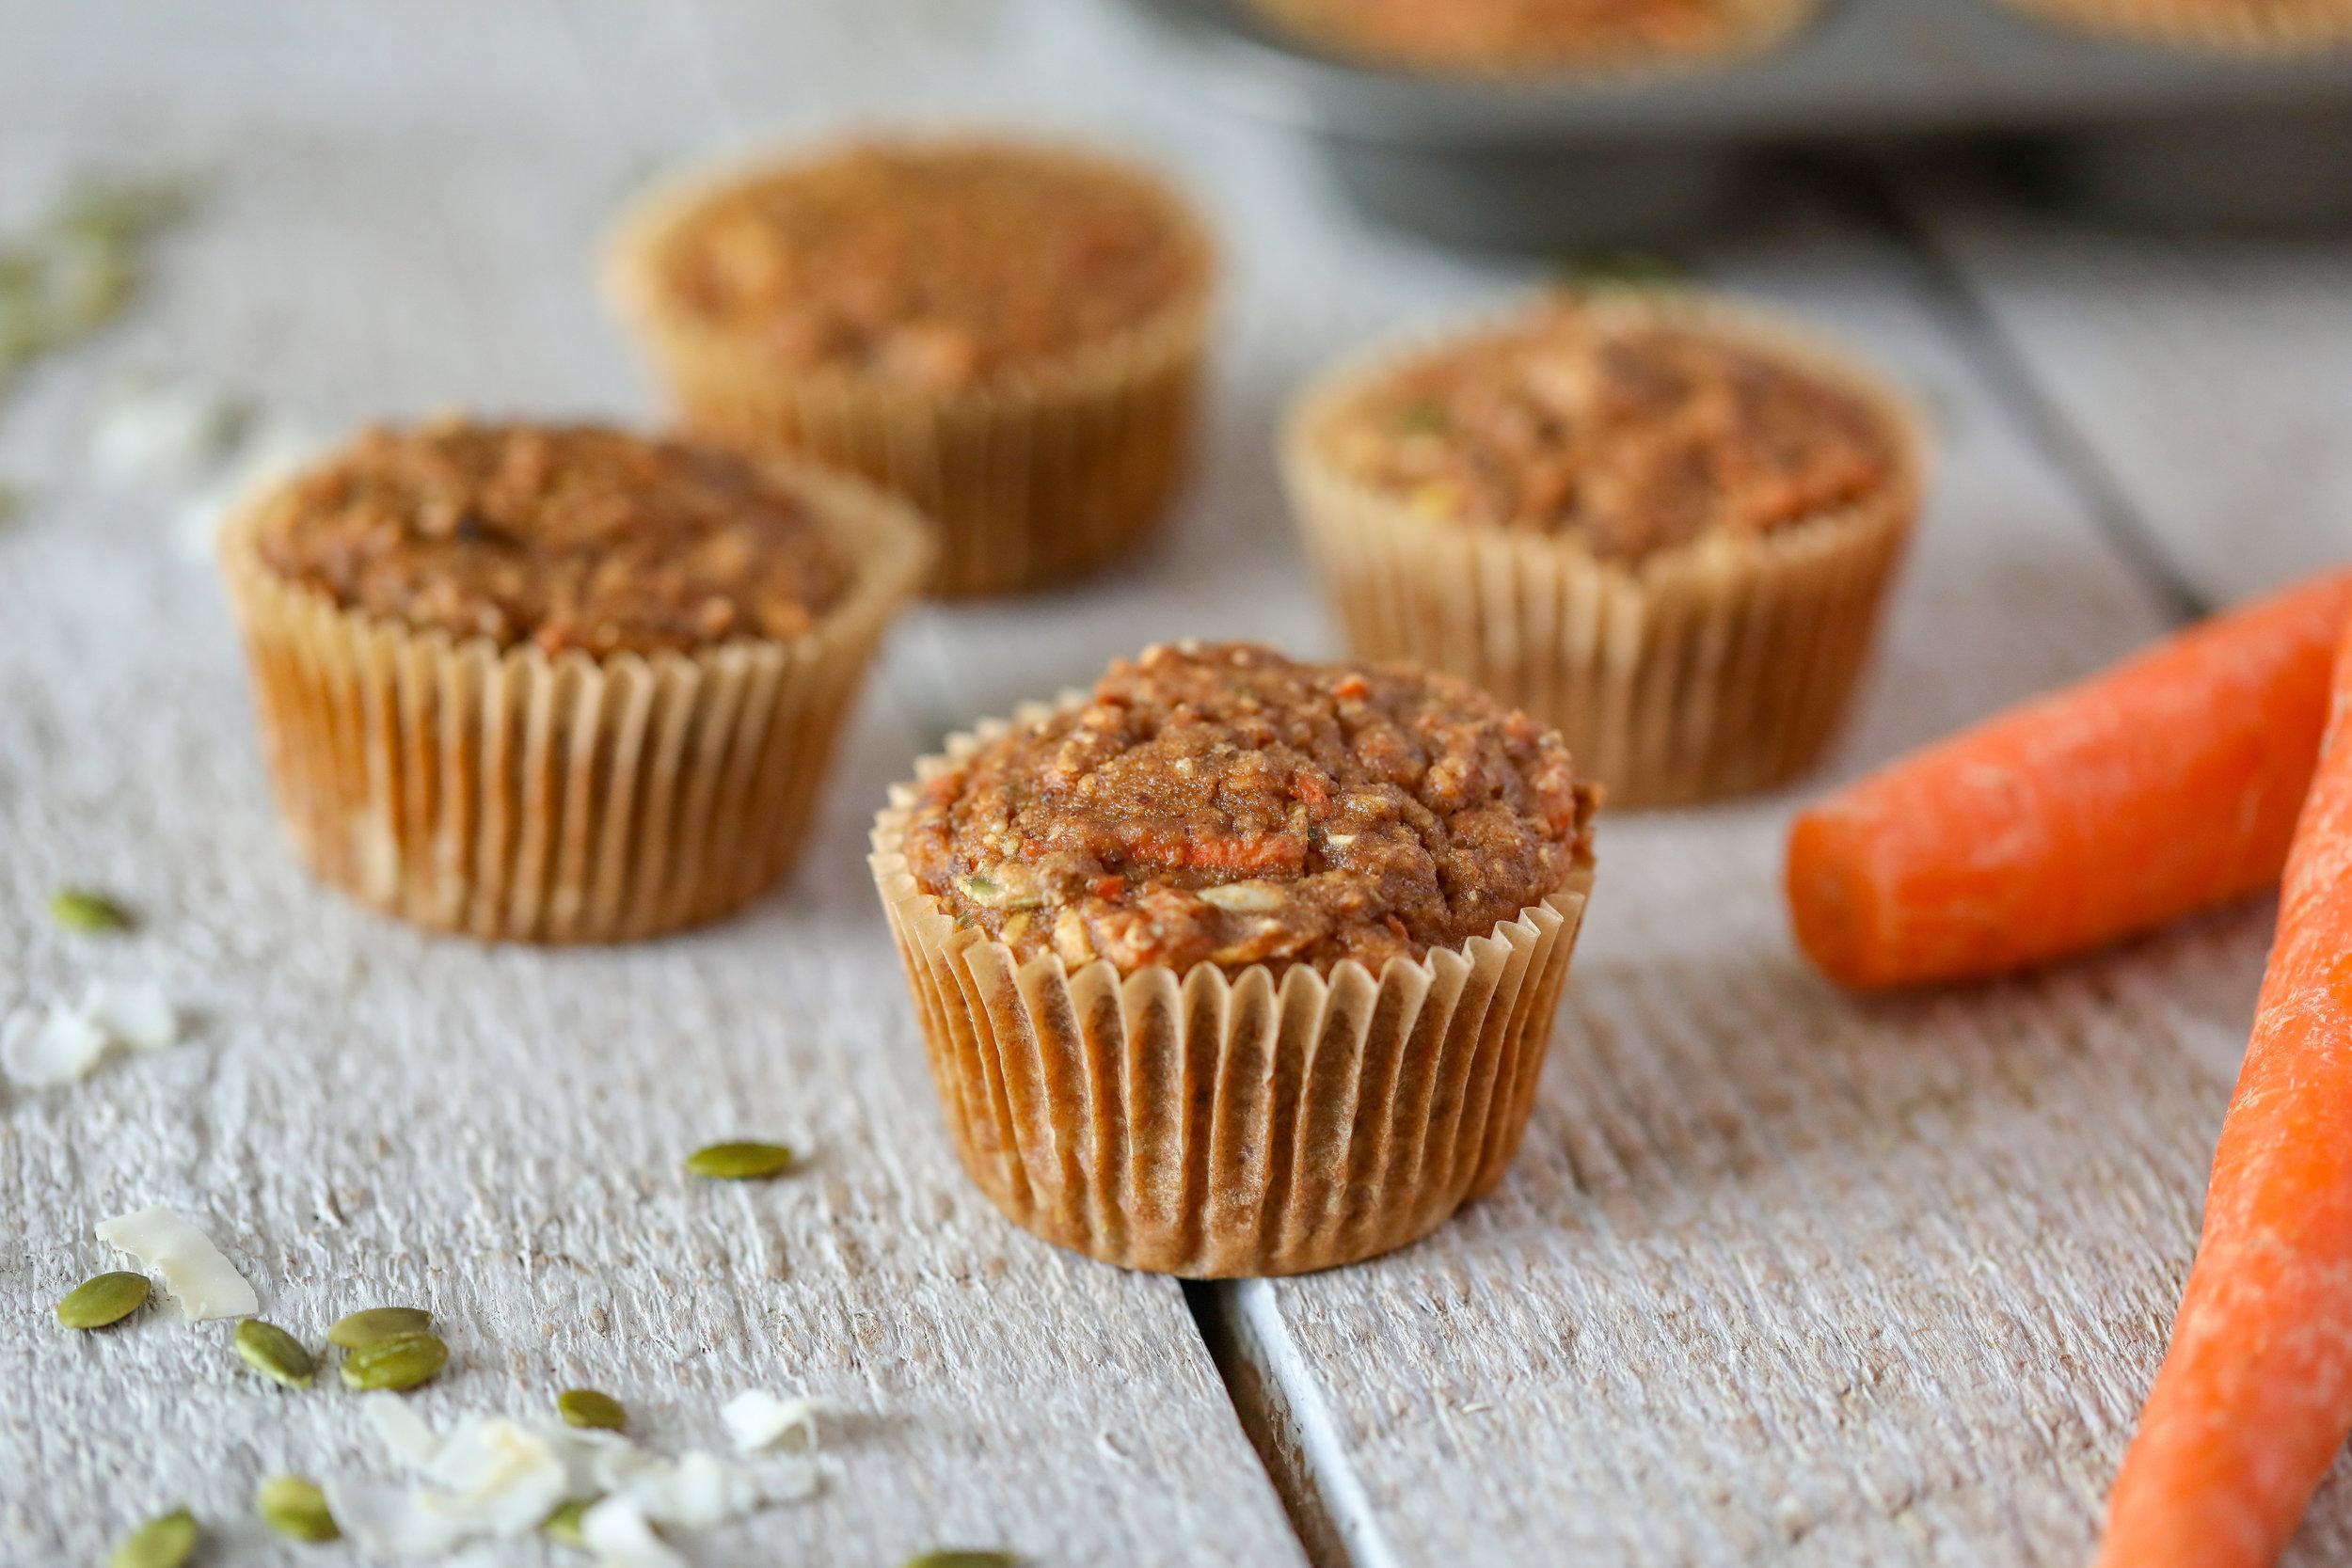 Healthy Gluten-free Vegan Morning Glory Muffins